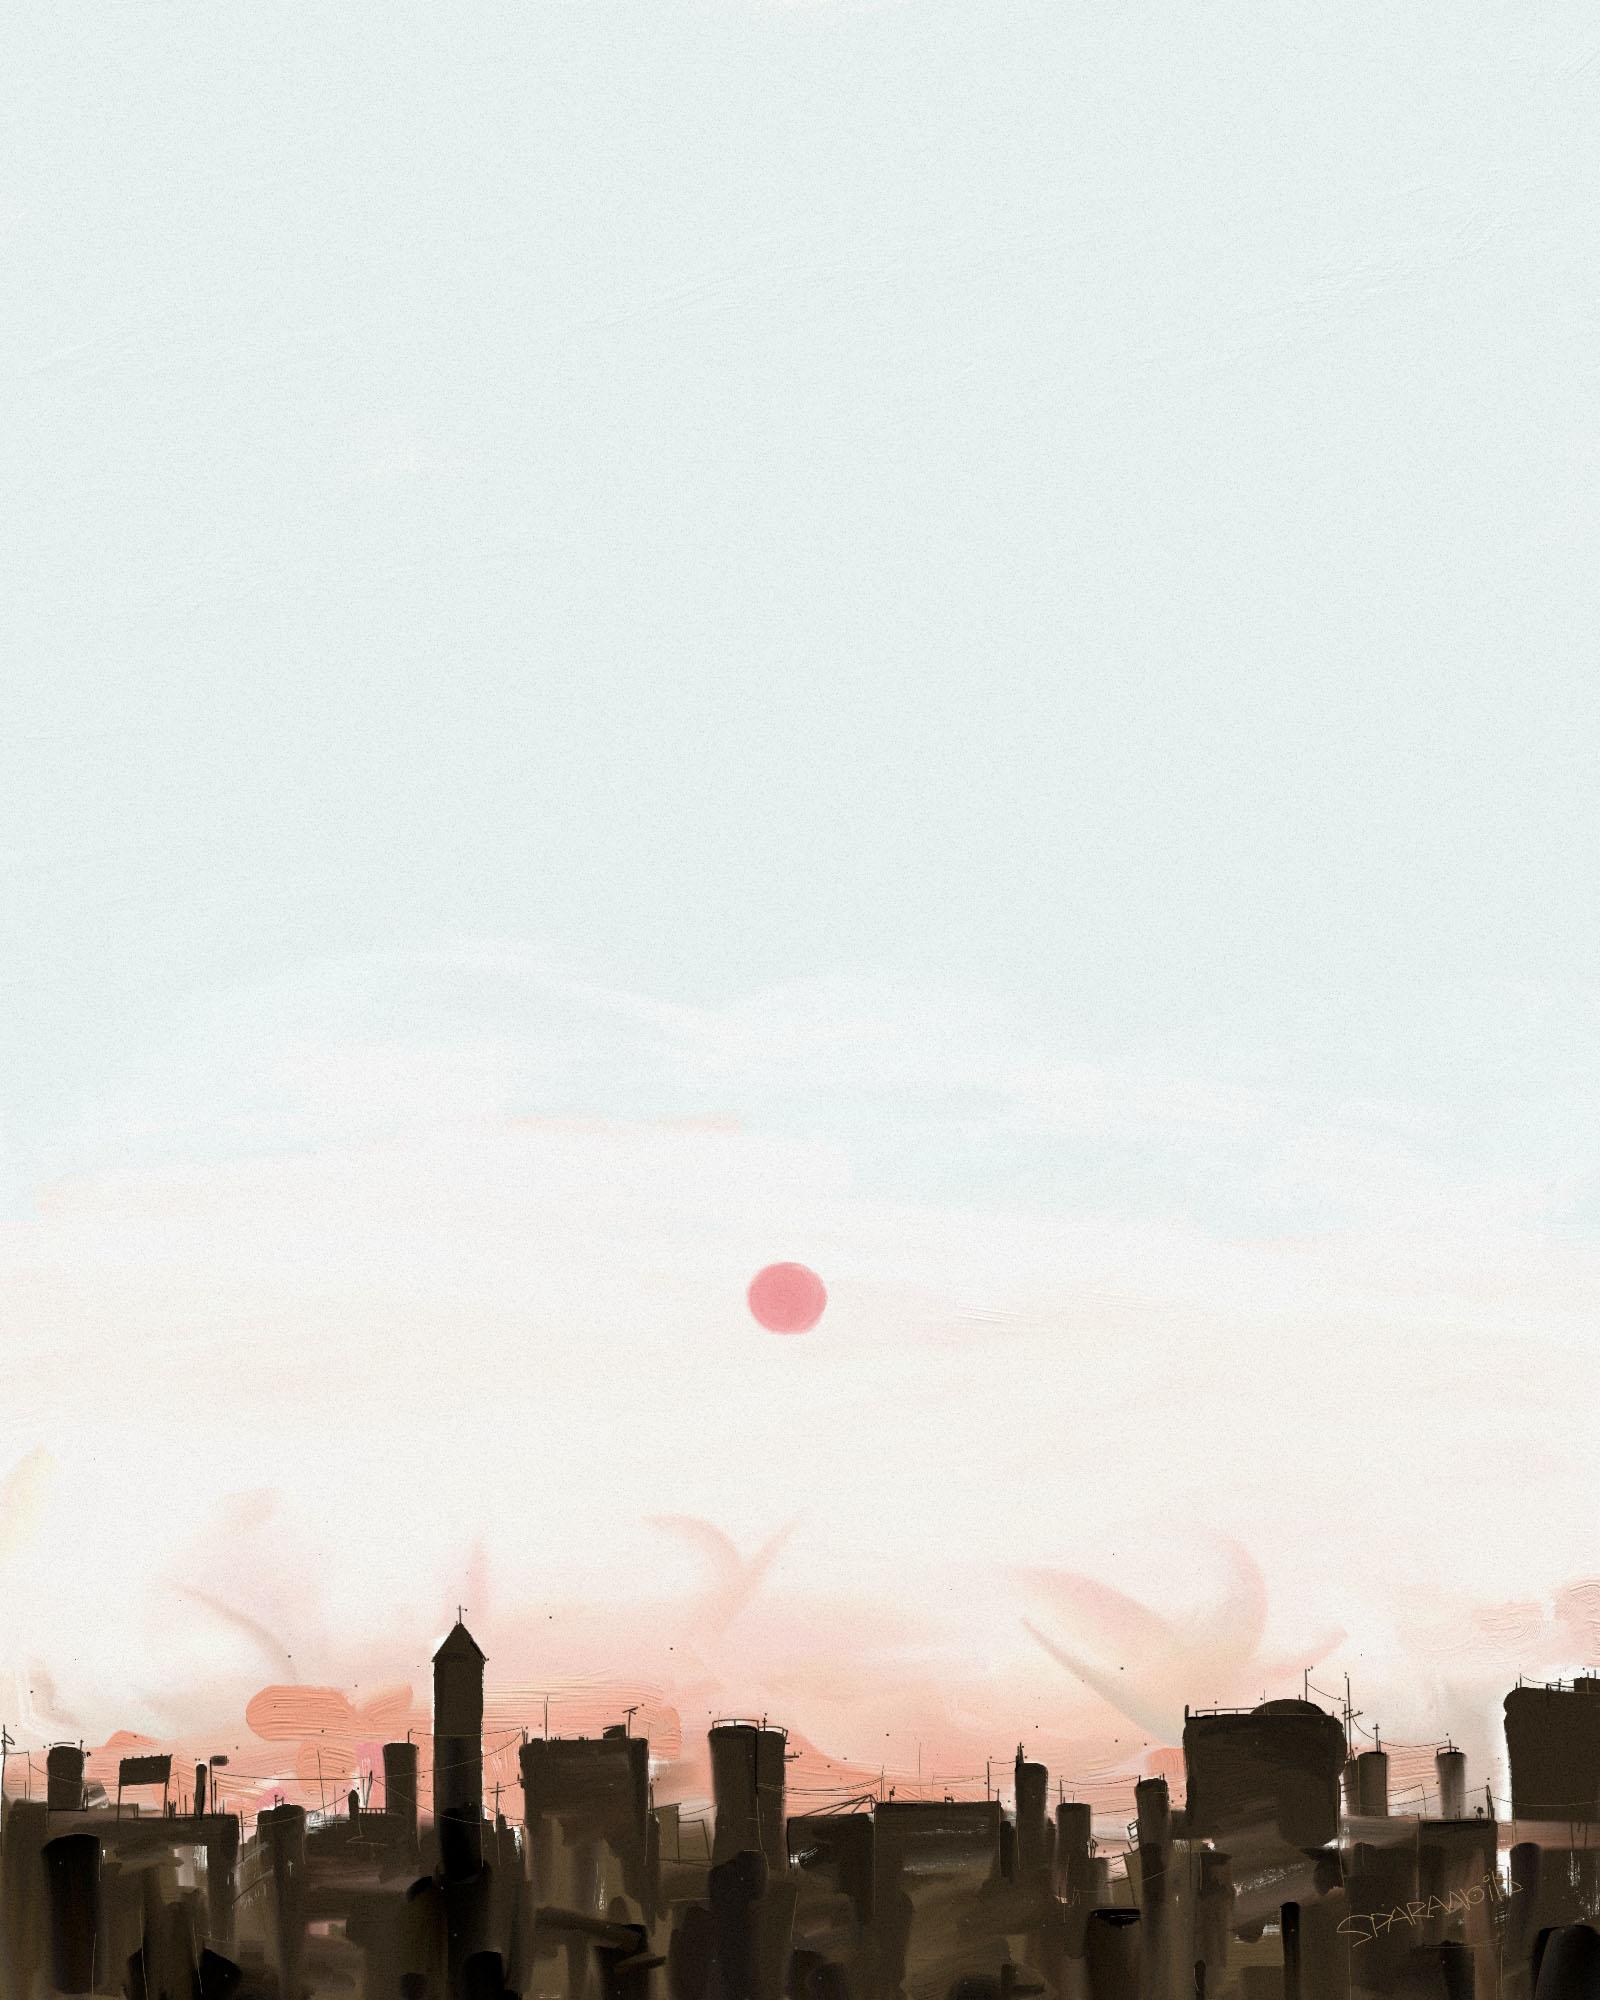 6:53 PM